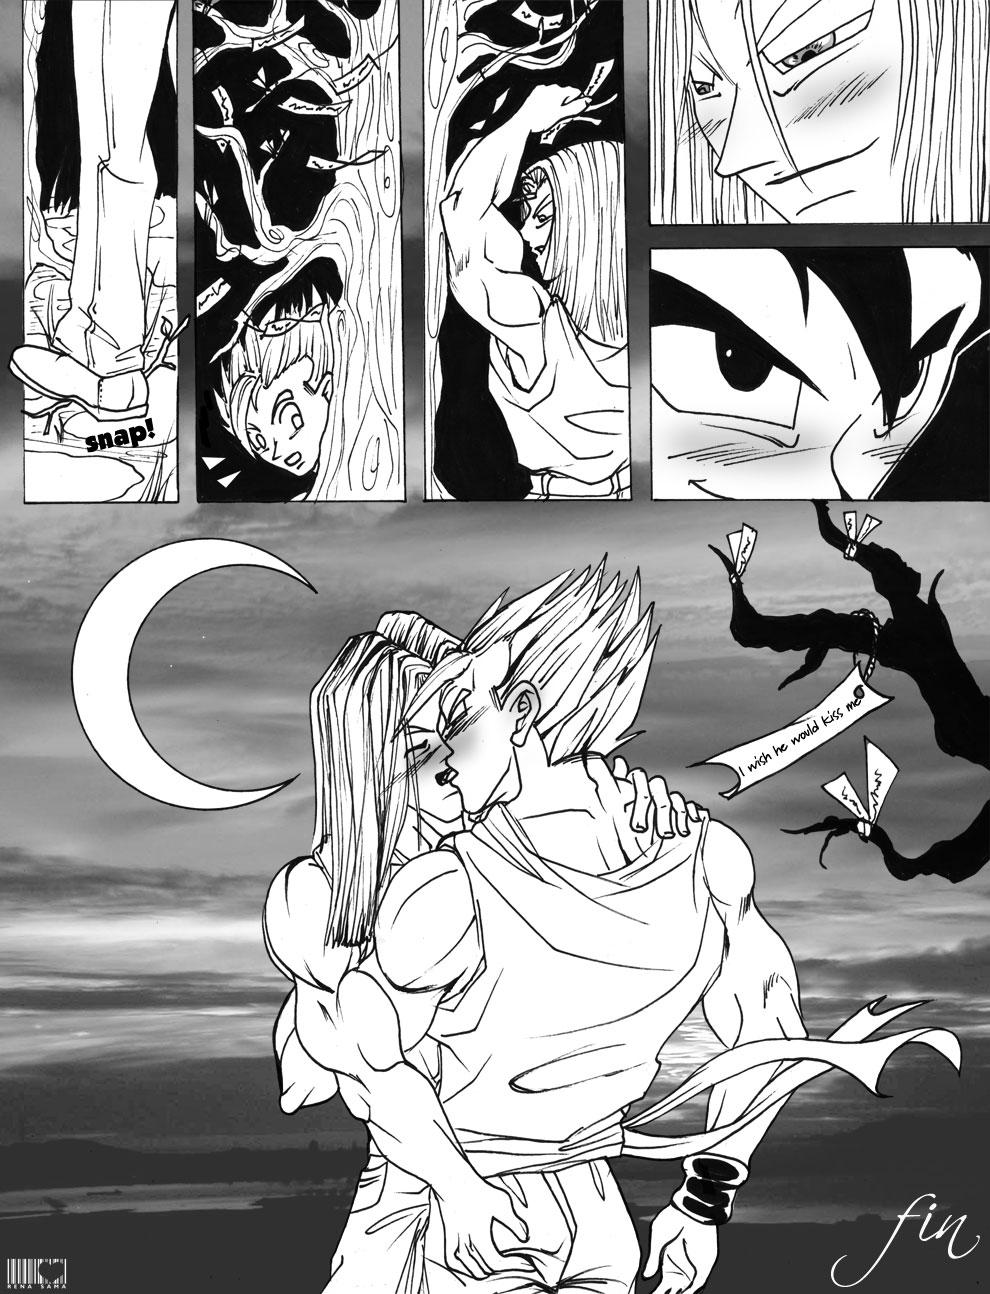 Dragon ball z porn comic Dragon Ball Z Porn Comics Hentai Comics Gay Comic Dragon Ball Yaoi ...